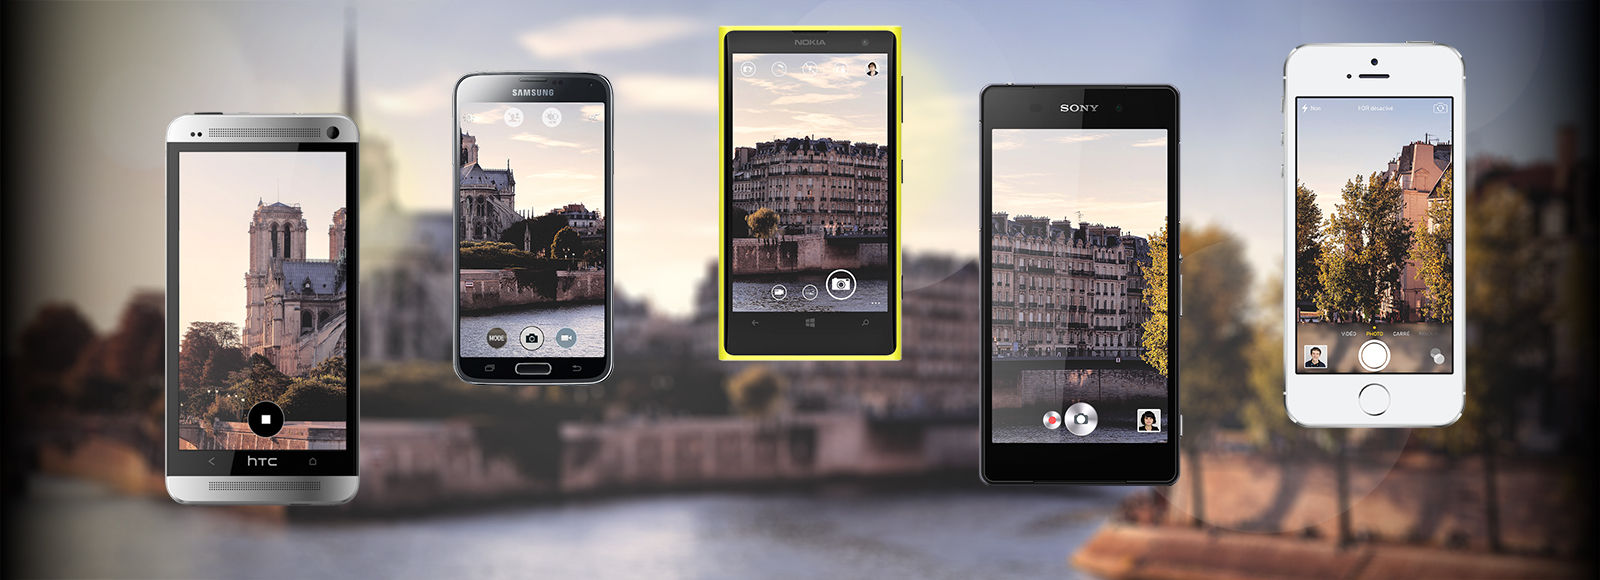 comparatif des smartphones 4g pas cher meilleur mobile. Black Bedroom Furniture Sets. Home Design Ideas